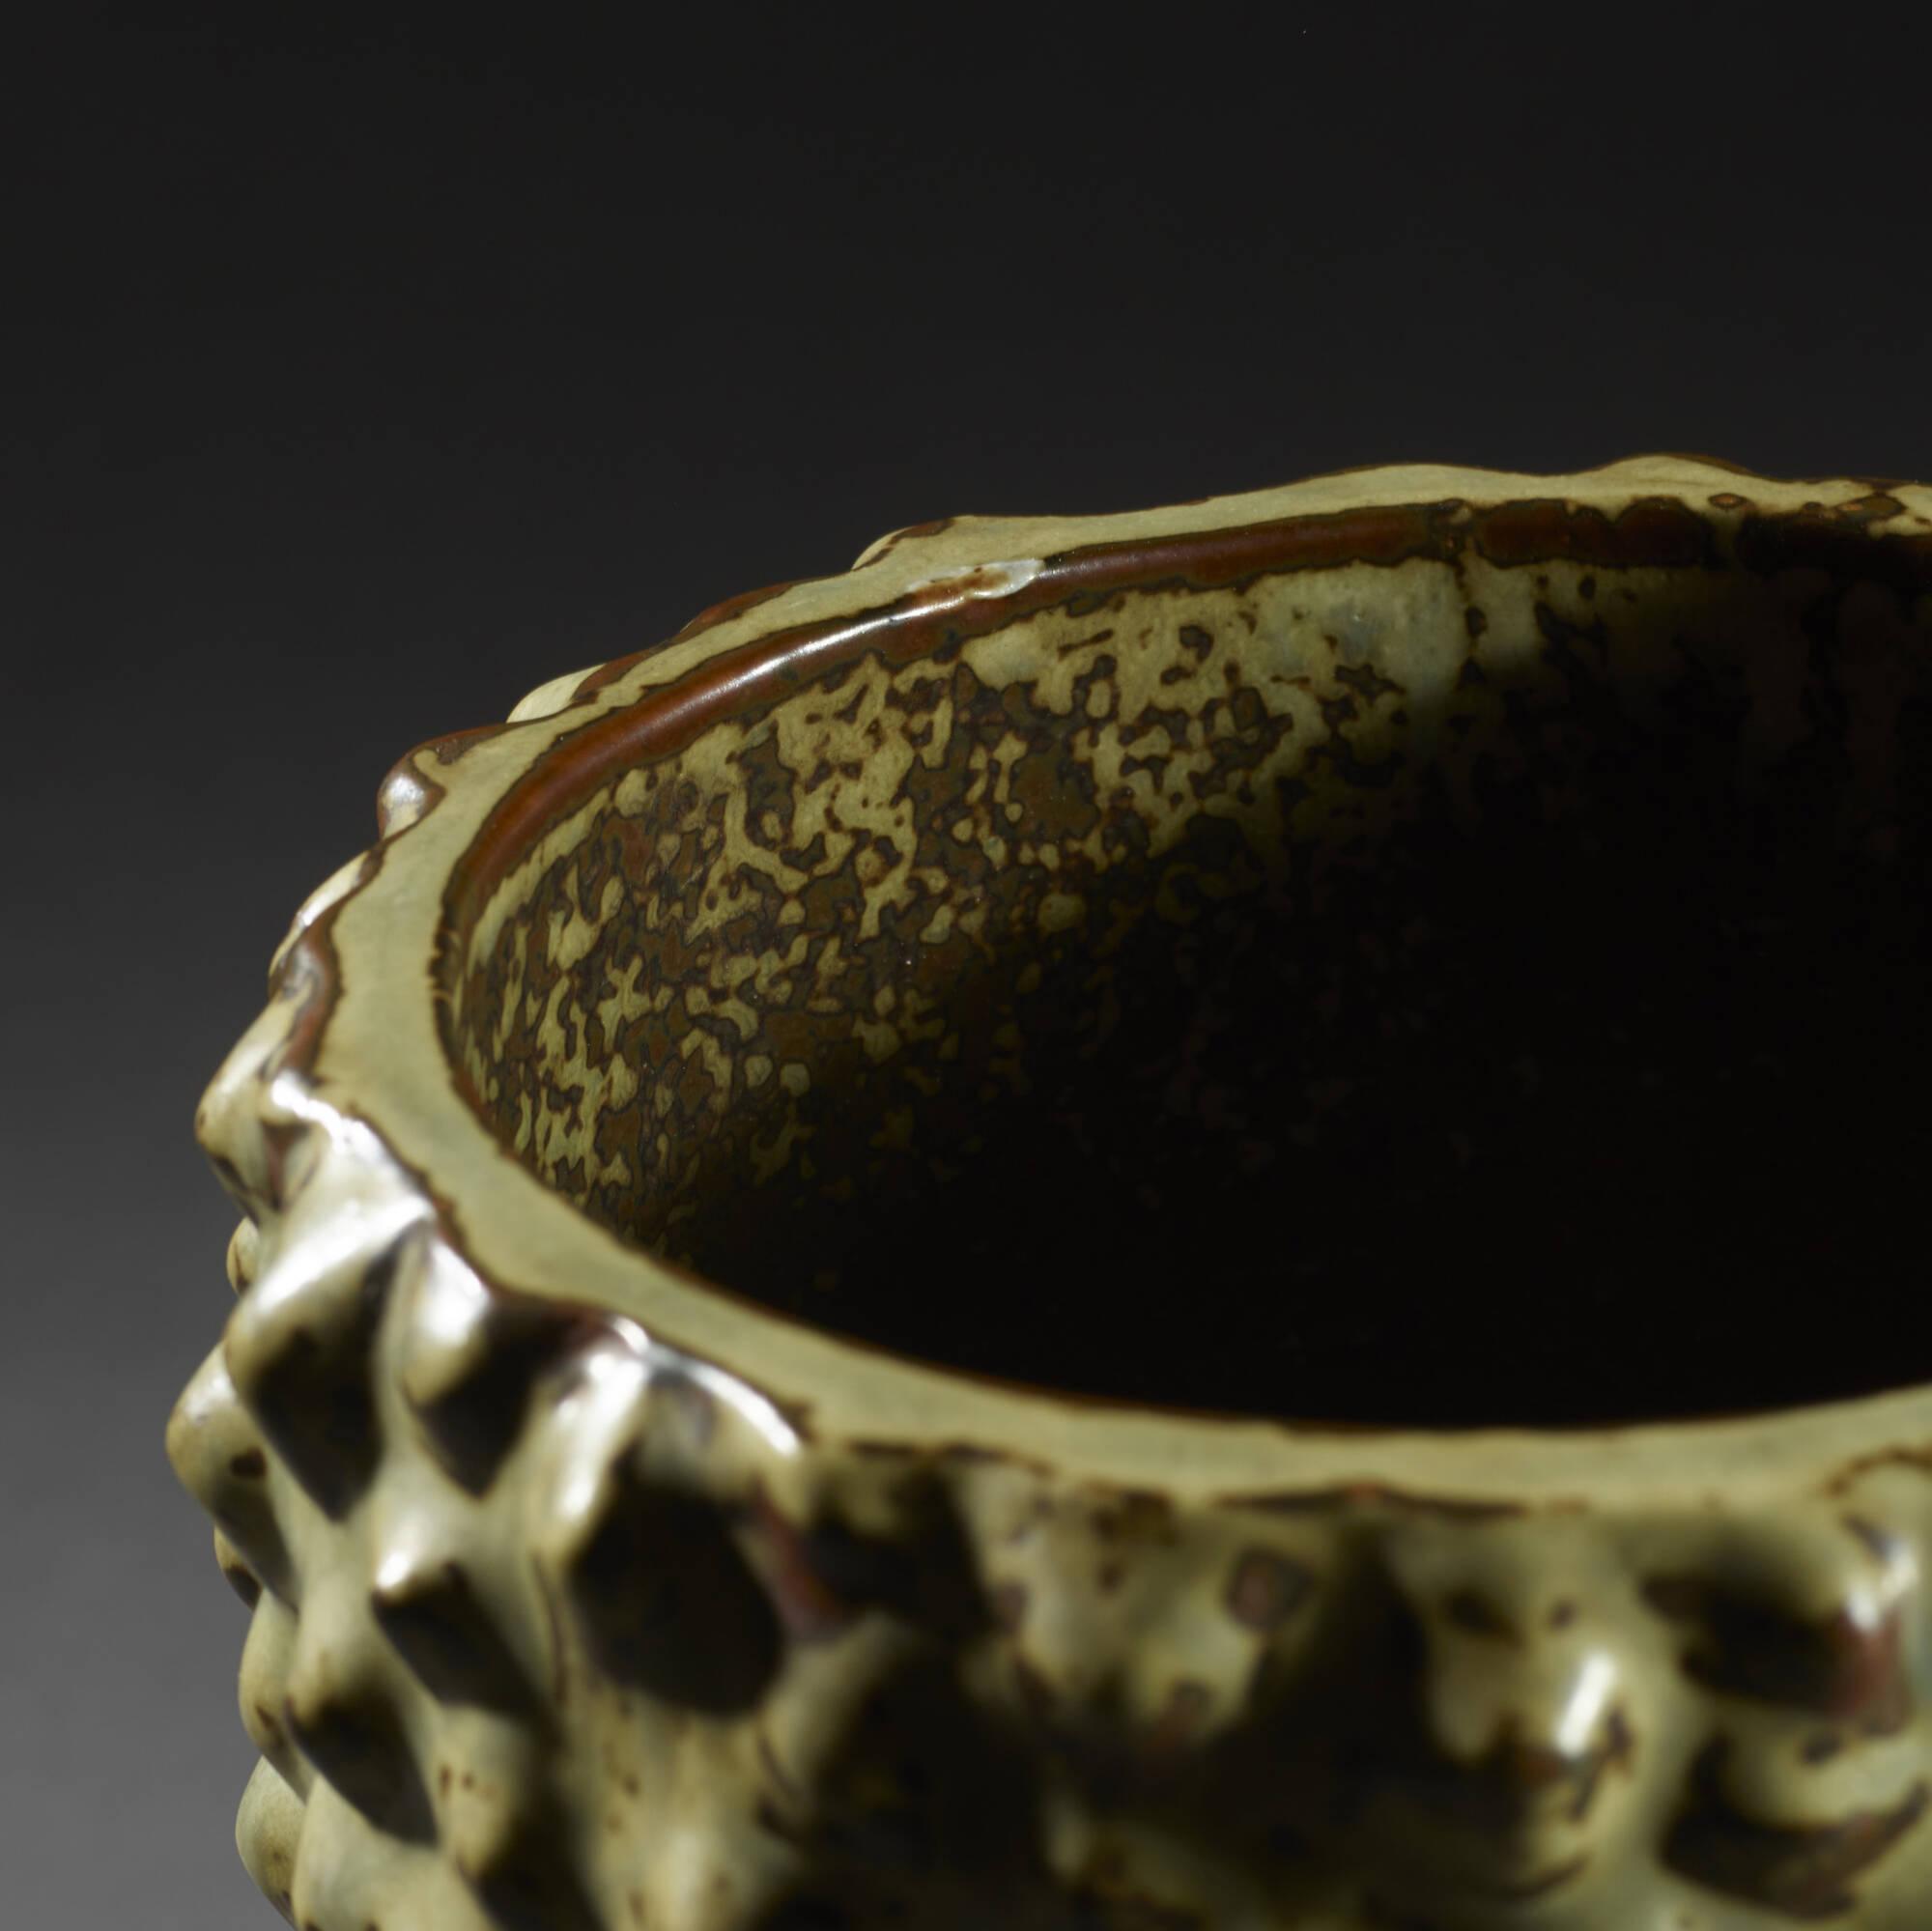 143: Axel Salto / Budding vase (3 of 4)